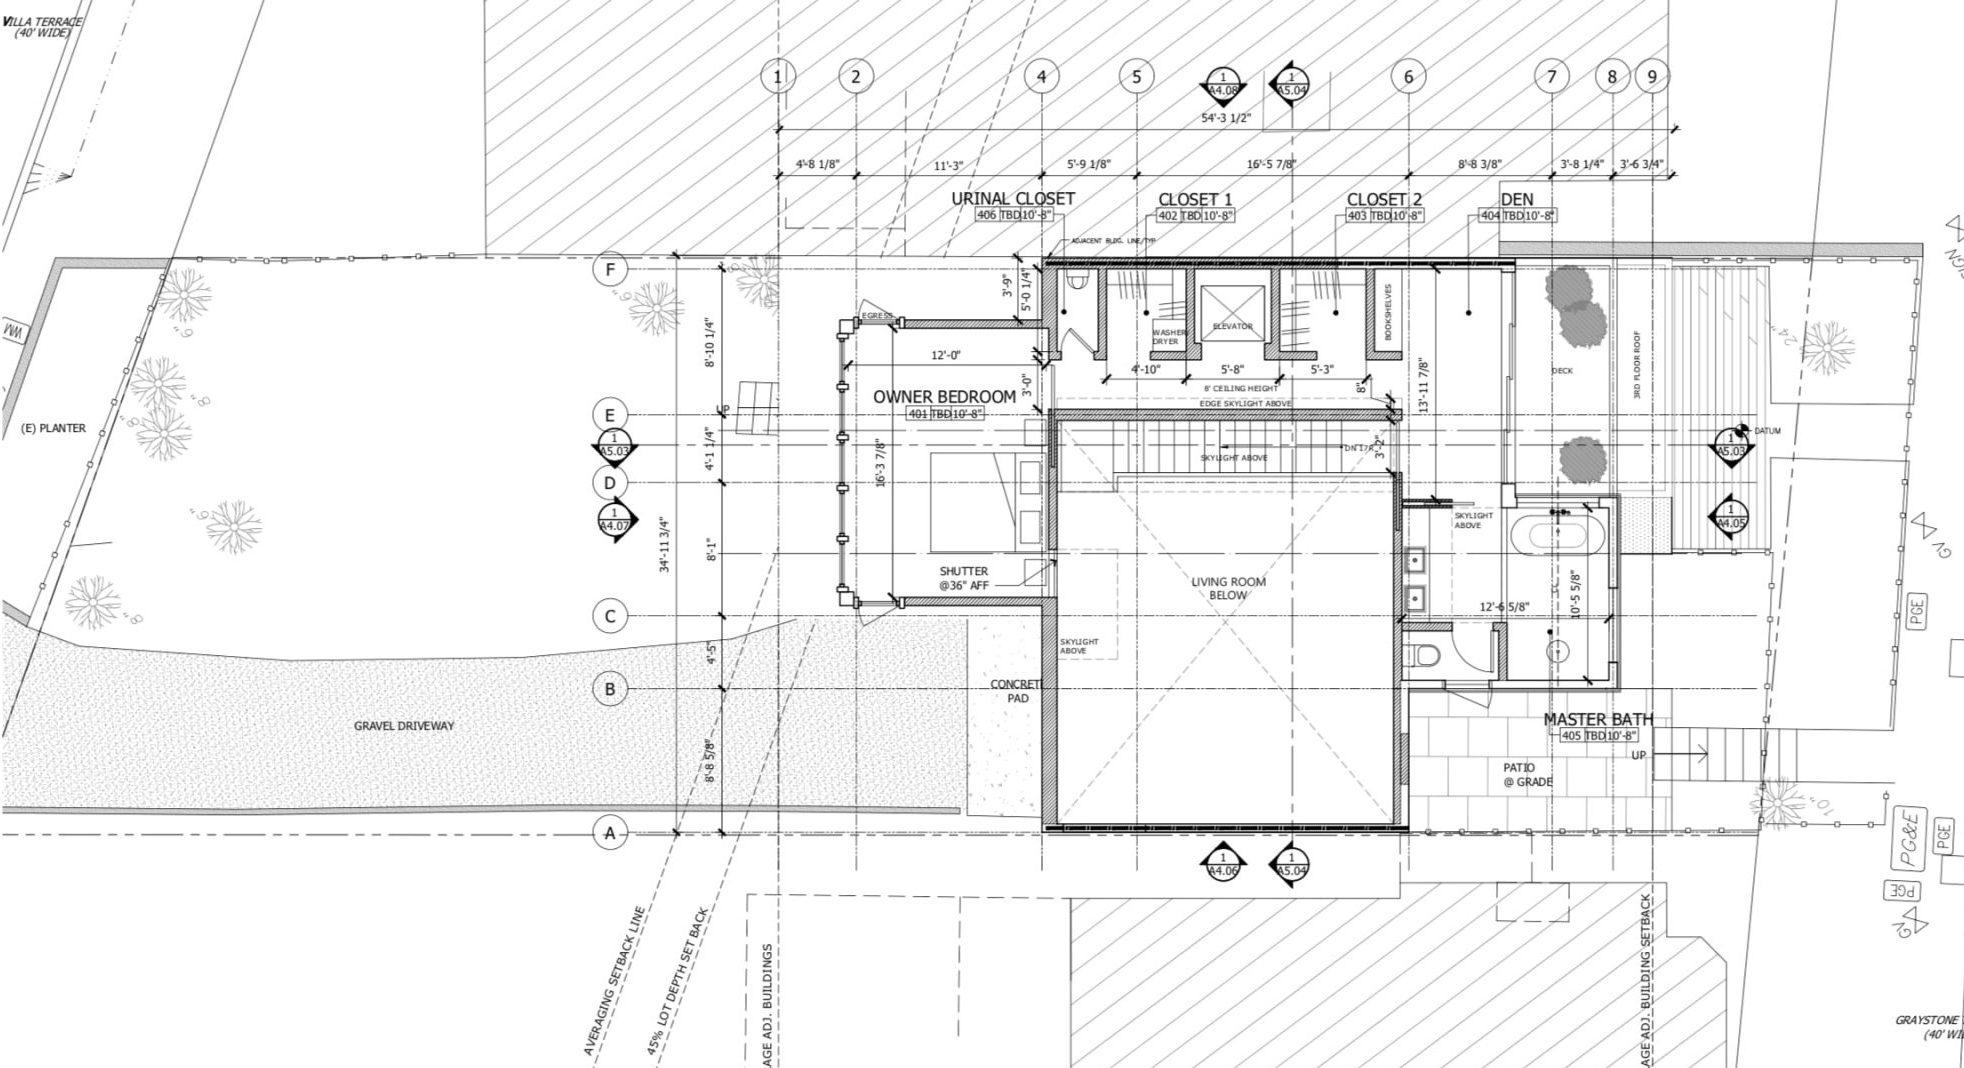 135 Graystone Terrace Fourth Floor Plan